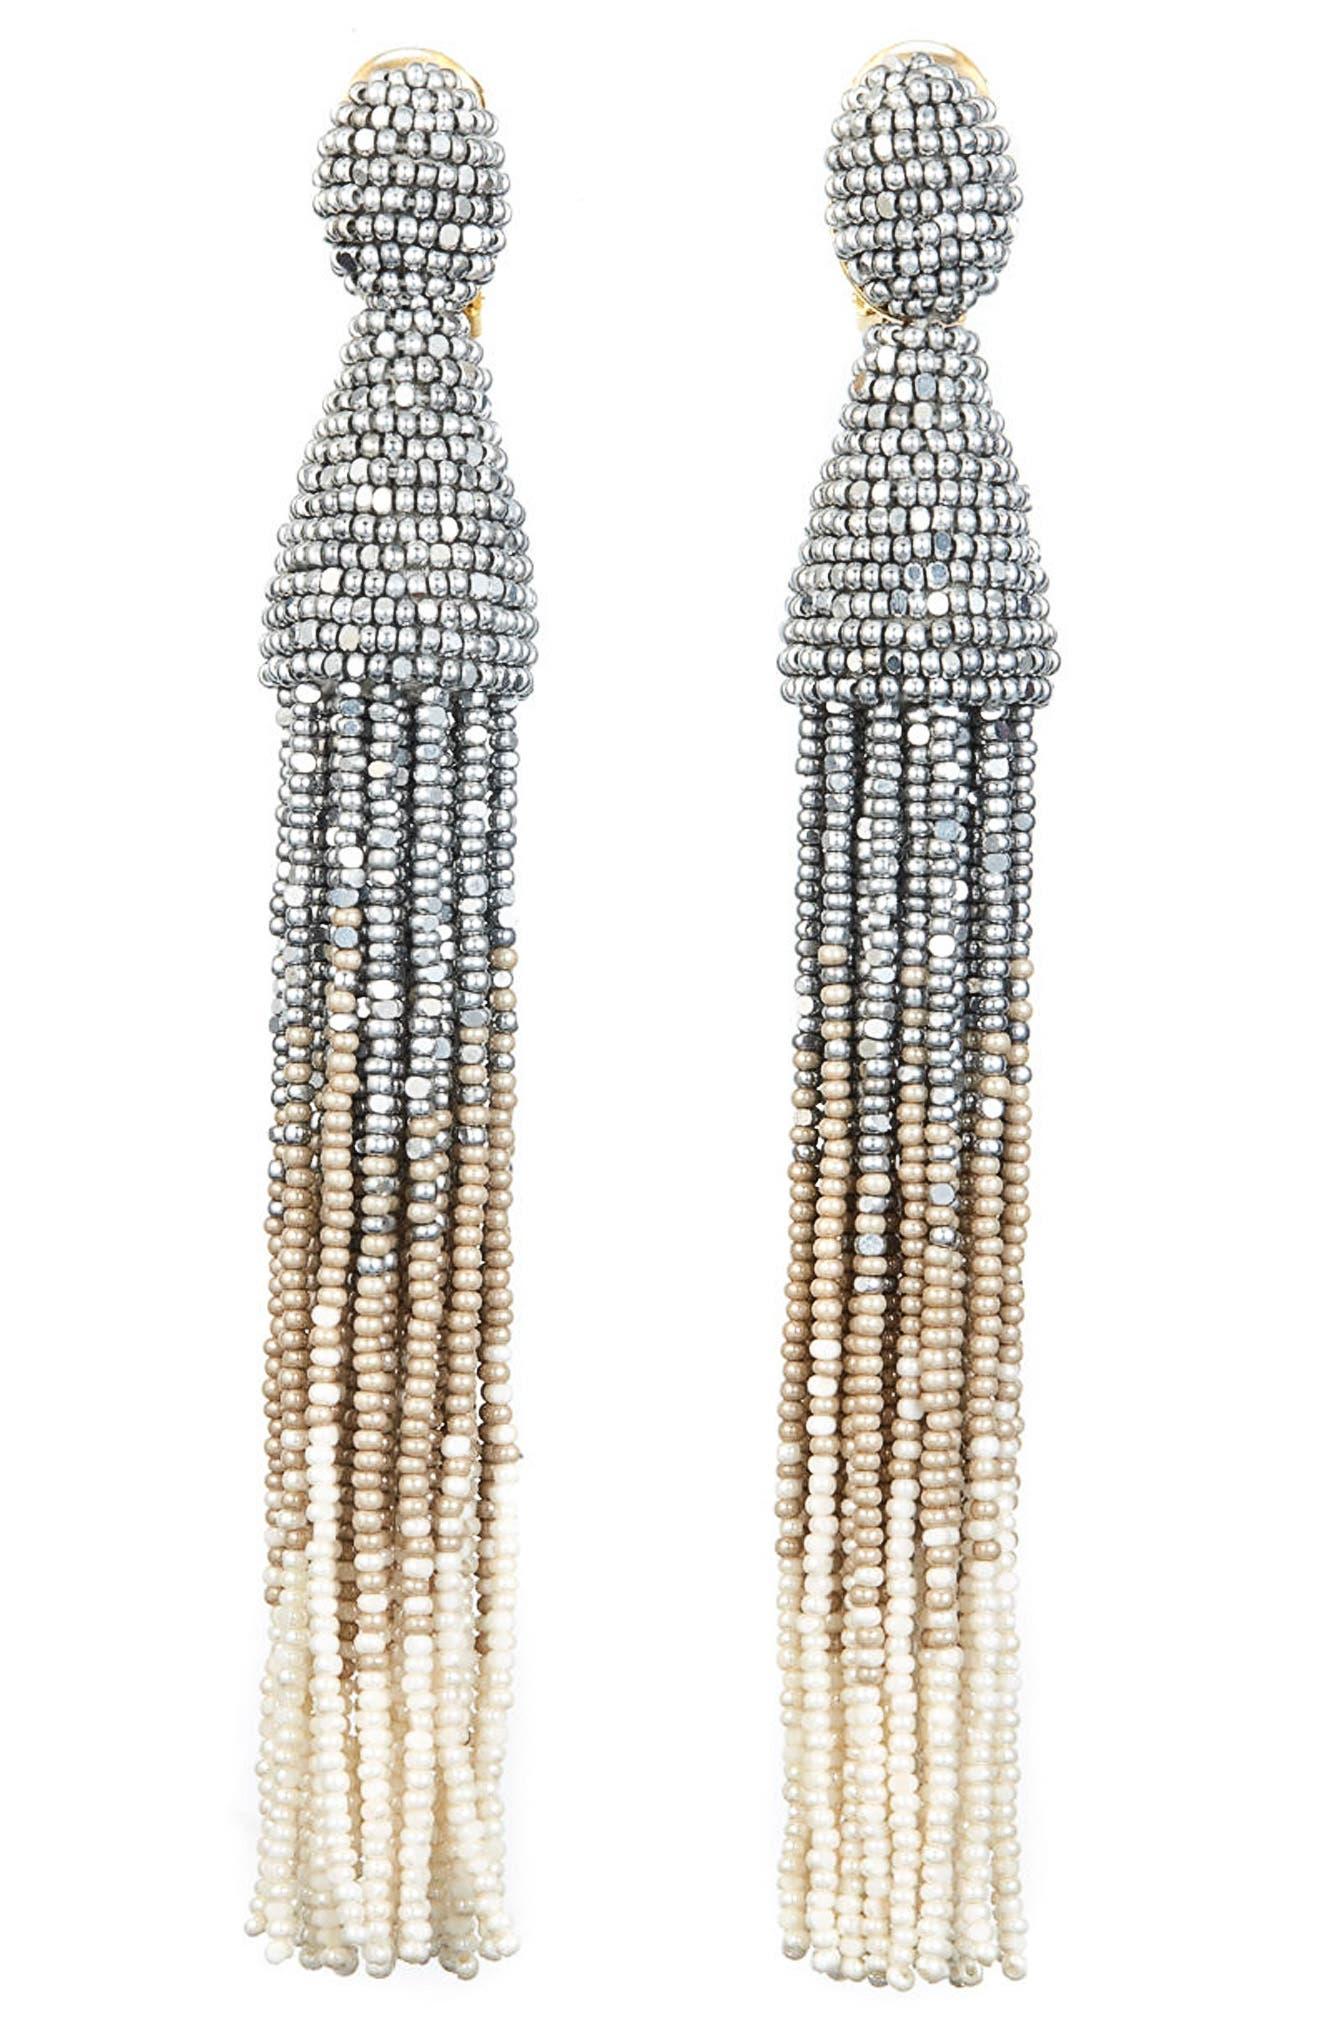 Ombré Long Tassel Clip Earrings,                             Main thumbnail 1, color,                             042